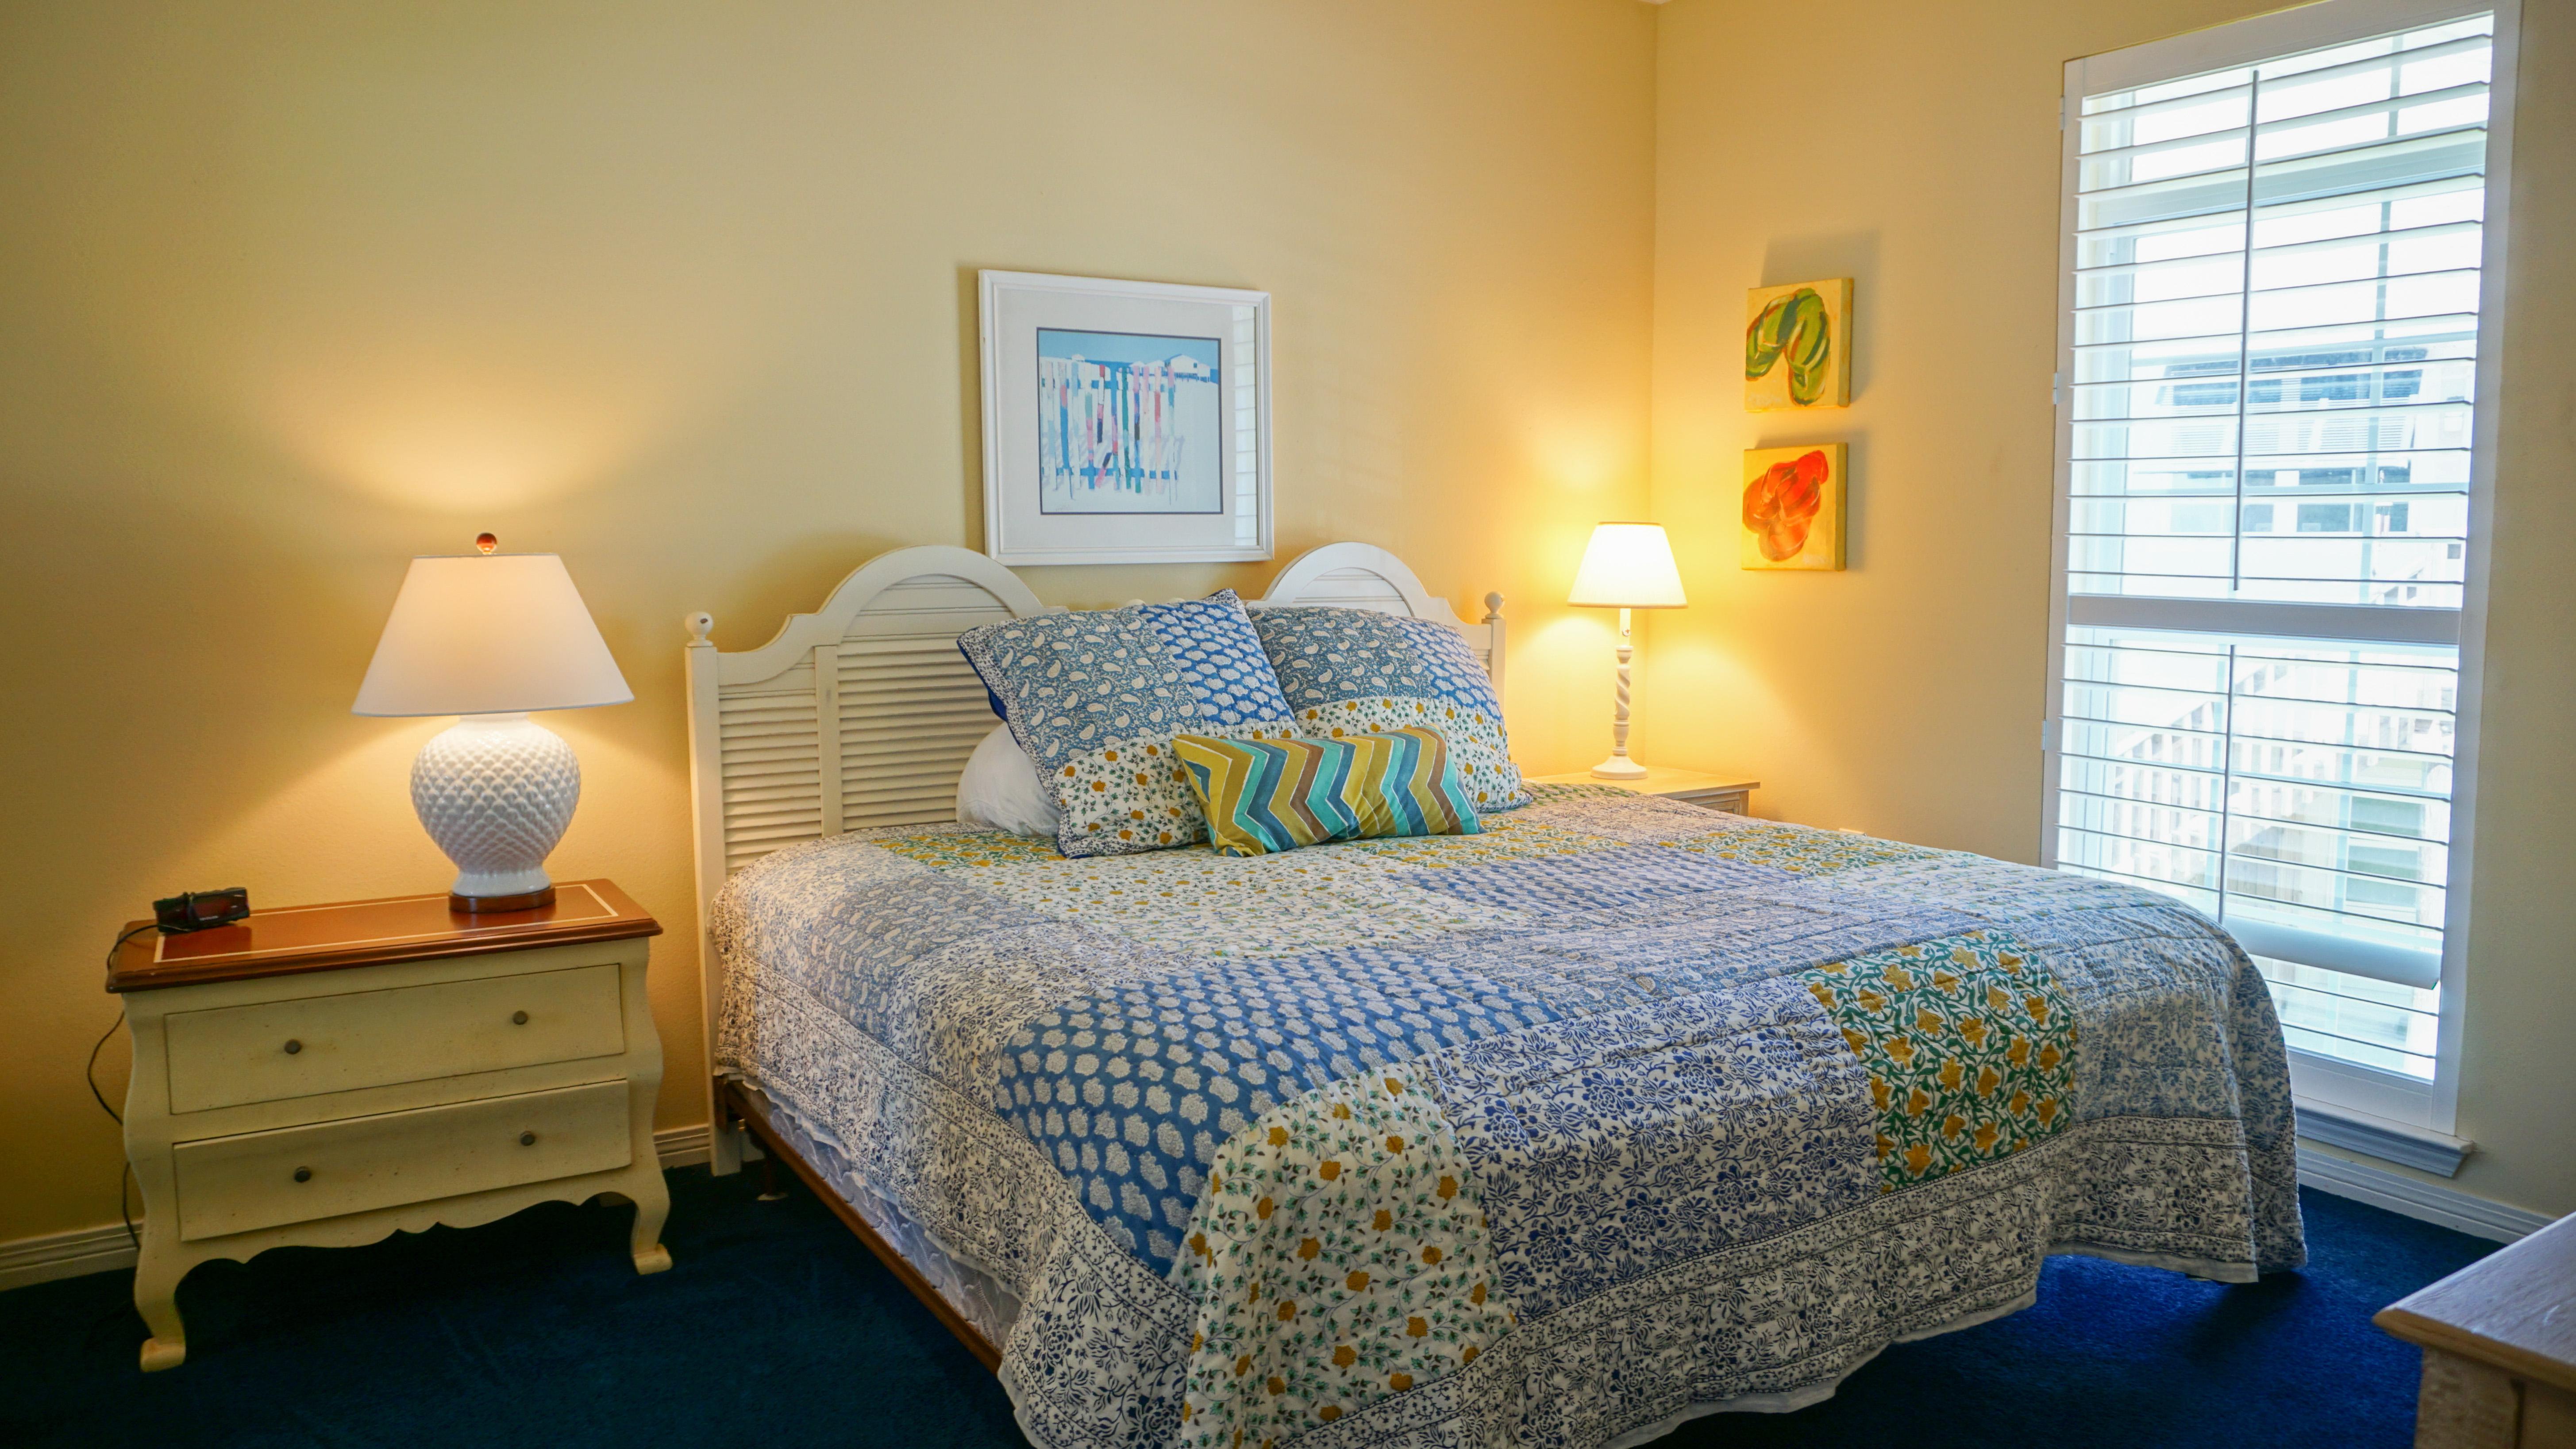 Ensenada Cinco 1730 House/Cottage rental in Pensacola Beach House Rentals in Pensacola Beach Florida - #23